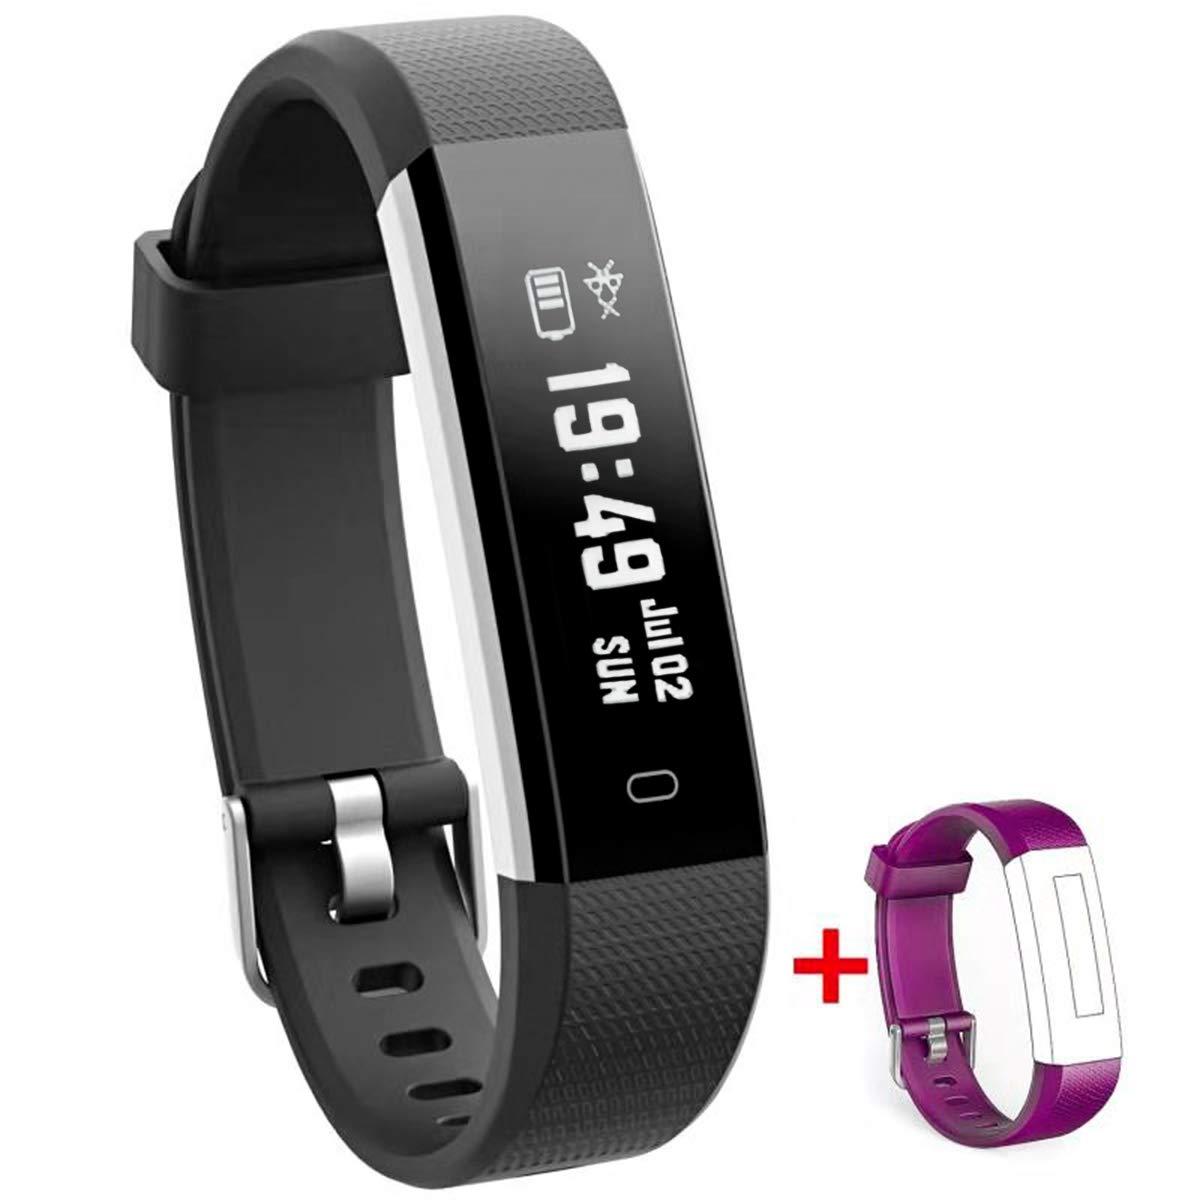 NAKOSITE RAY2434 Reloj inteligente mujer hombre Smartwatch Pulsera actividad relojes Inteligentes deportivo, Podometro… 1